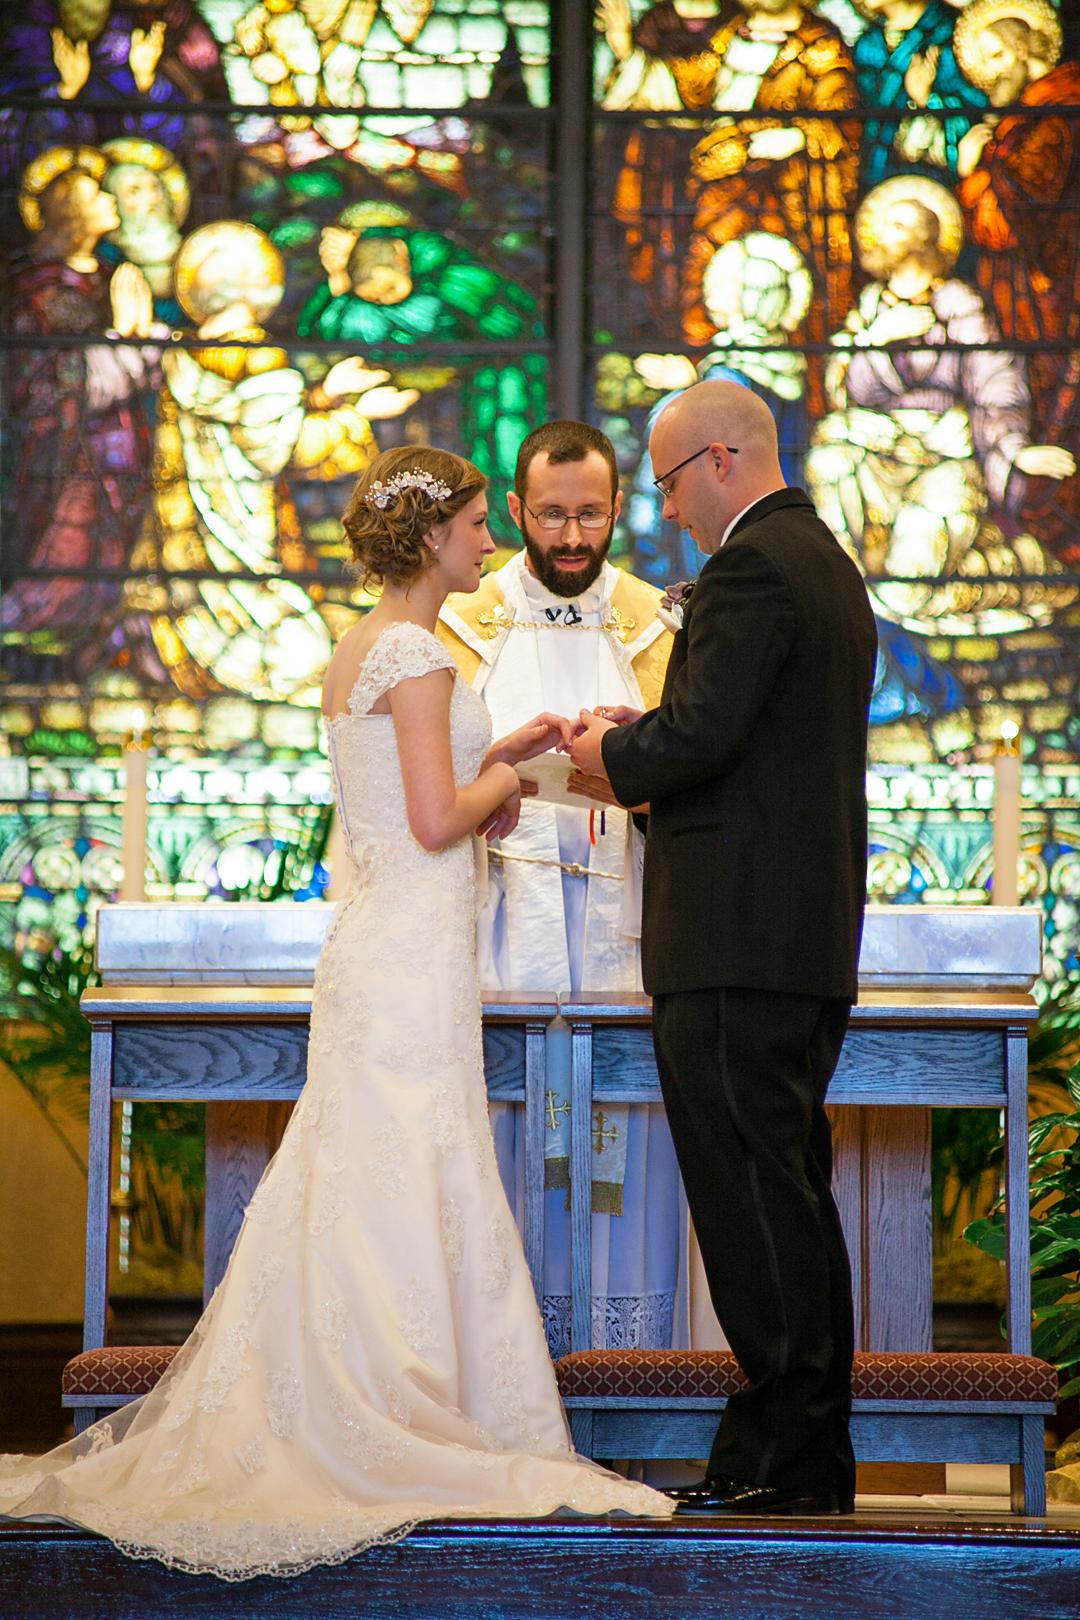 Carriage_club_kansas_city_mo_Missouri_kansas_ks_creative_wedding_photographer_best_jason_domingues_0010